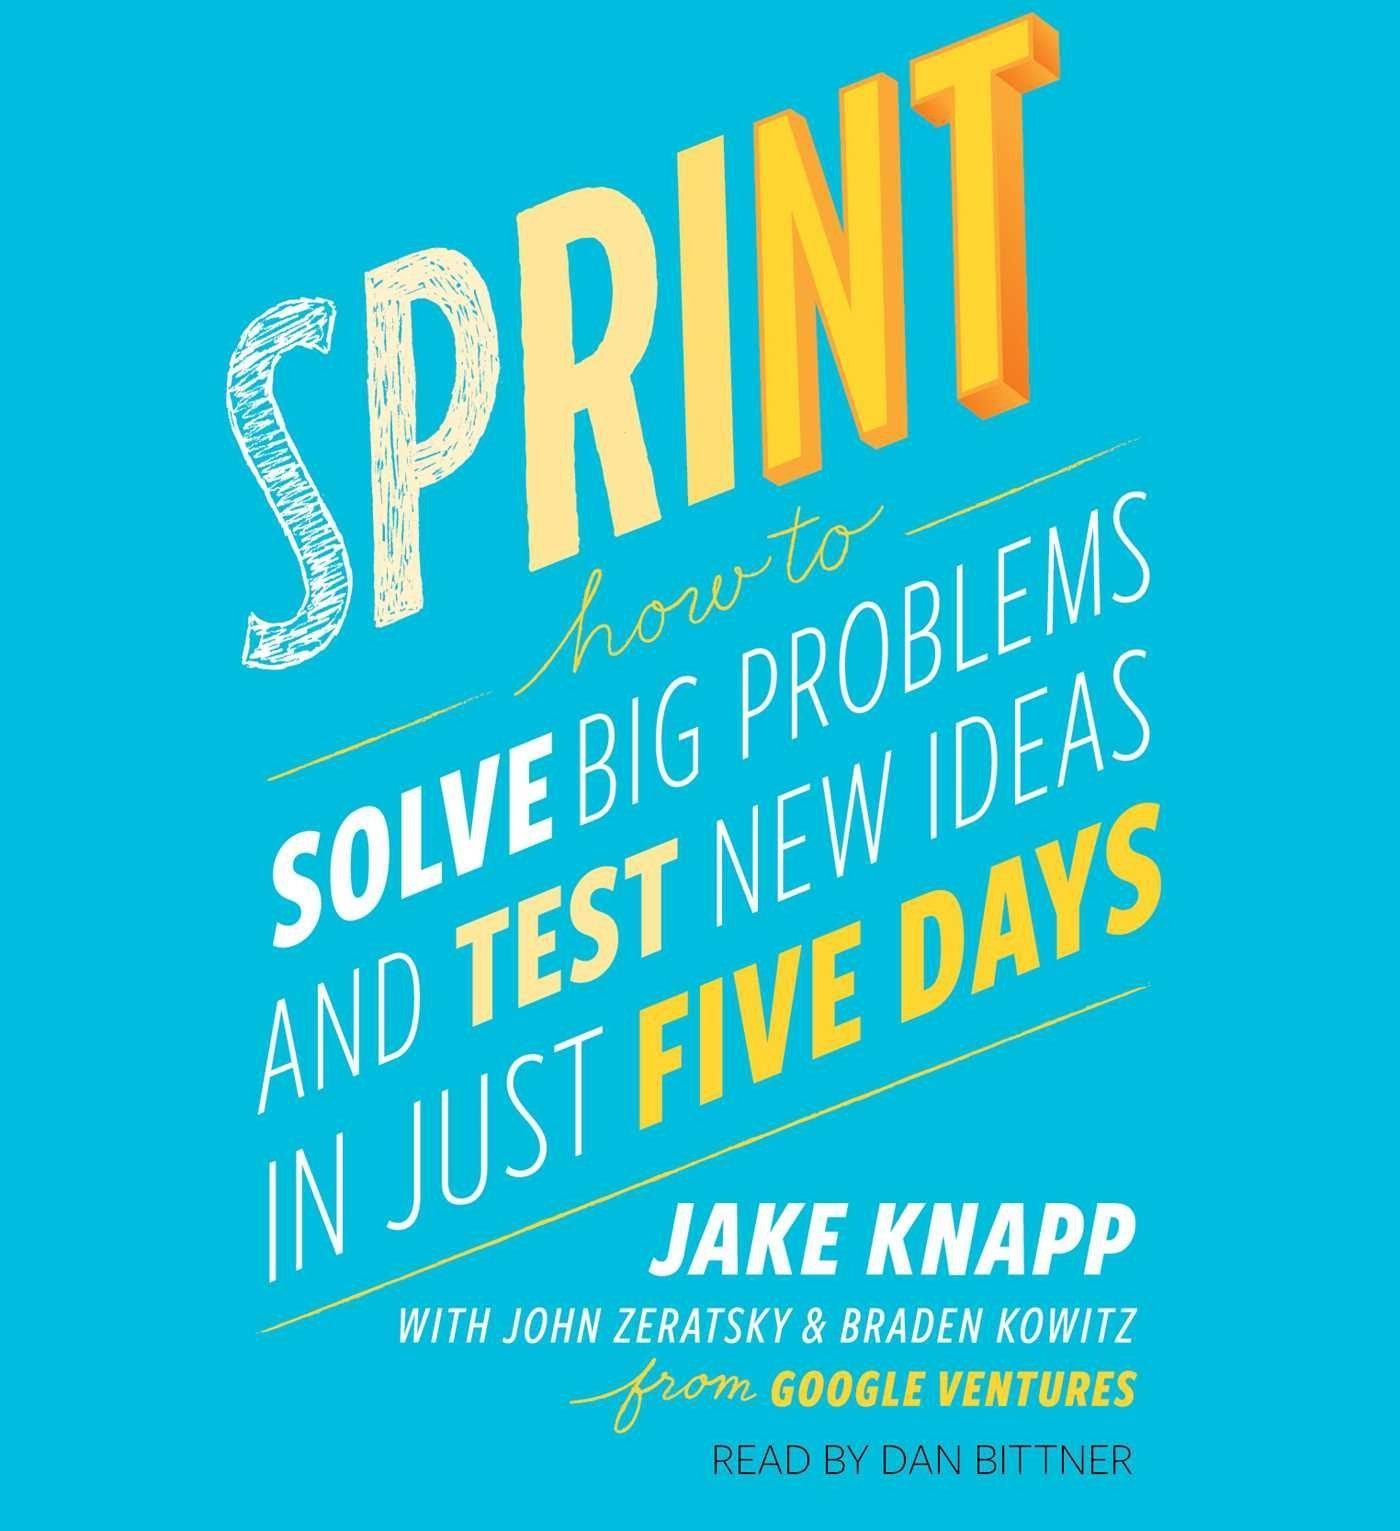 Sprint_Book.jpg